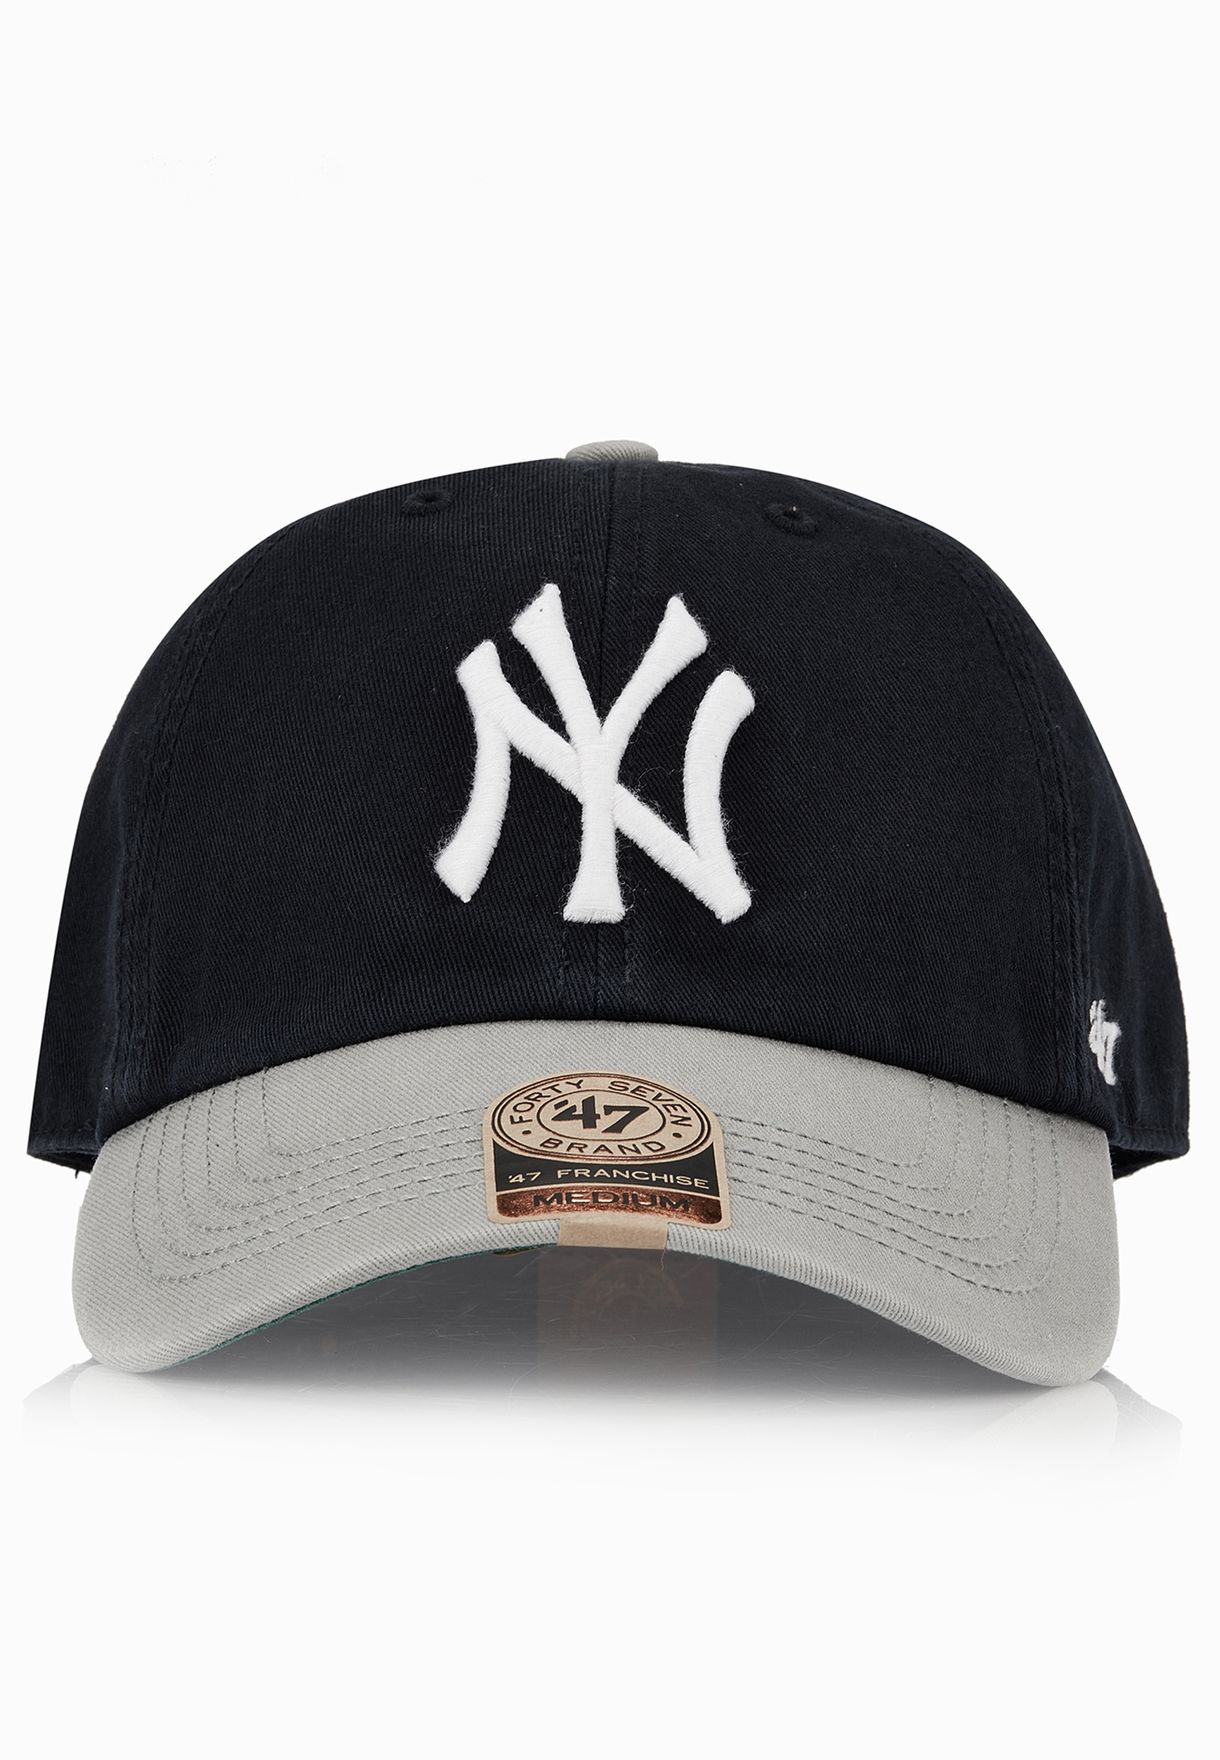 c426f95335e42 ... order 47 brand. new york yankees cap 0636d a1c47